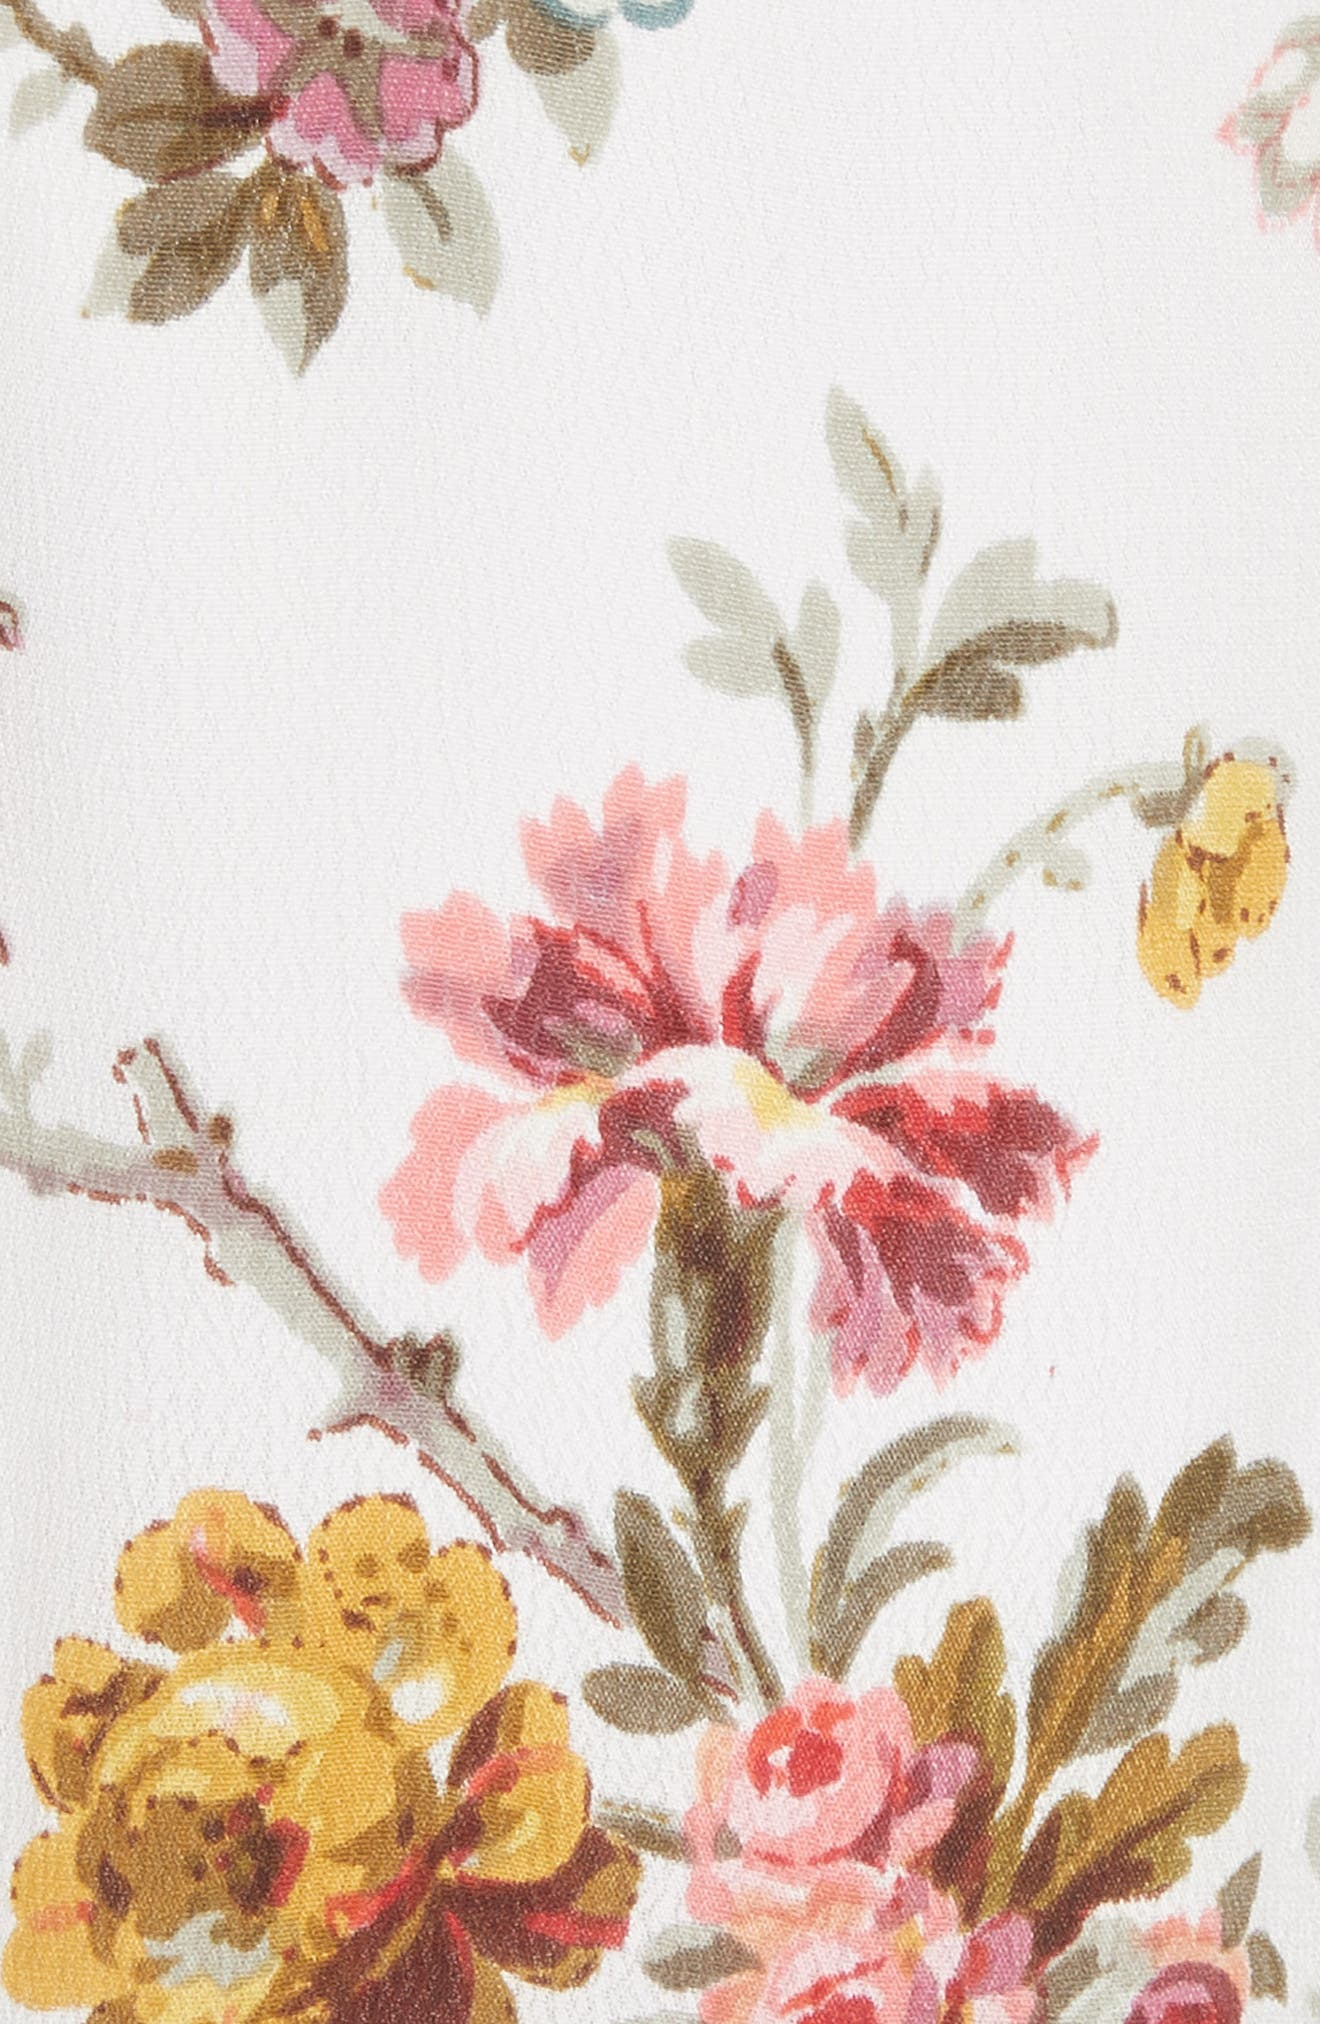 Rainbow Rose Wrap Dress,                             Alternate thumbnail 5, color,                             Ivory